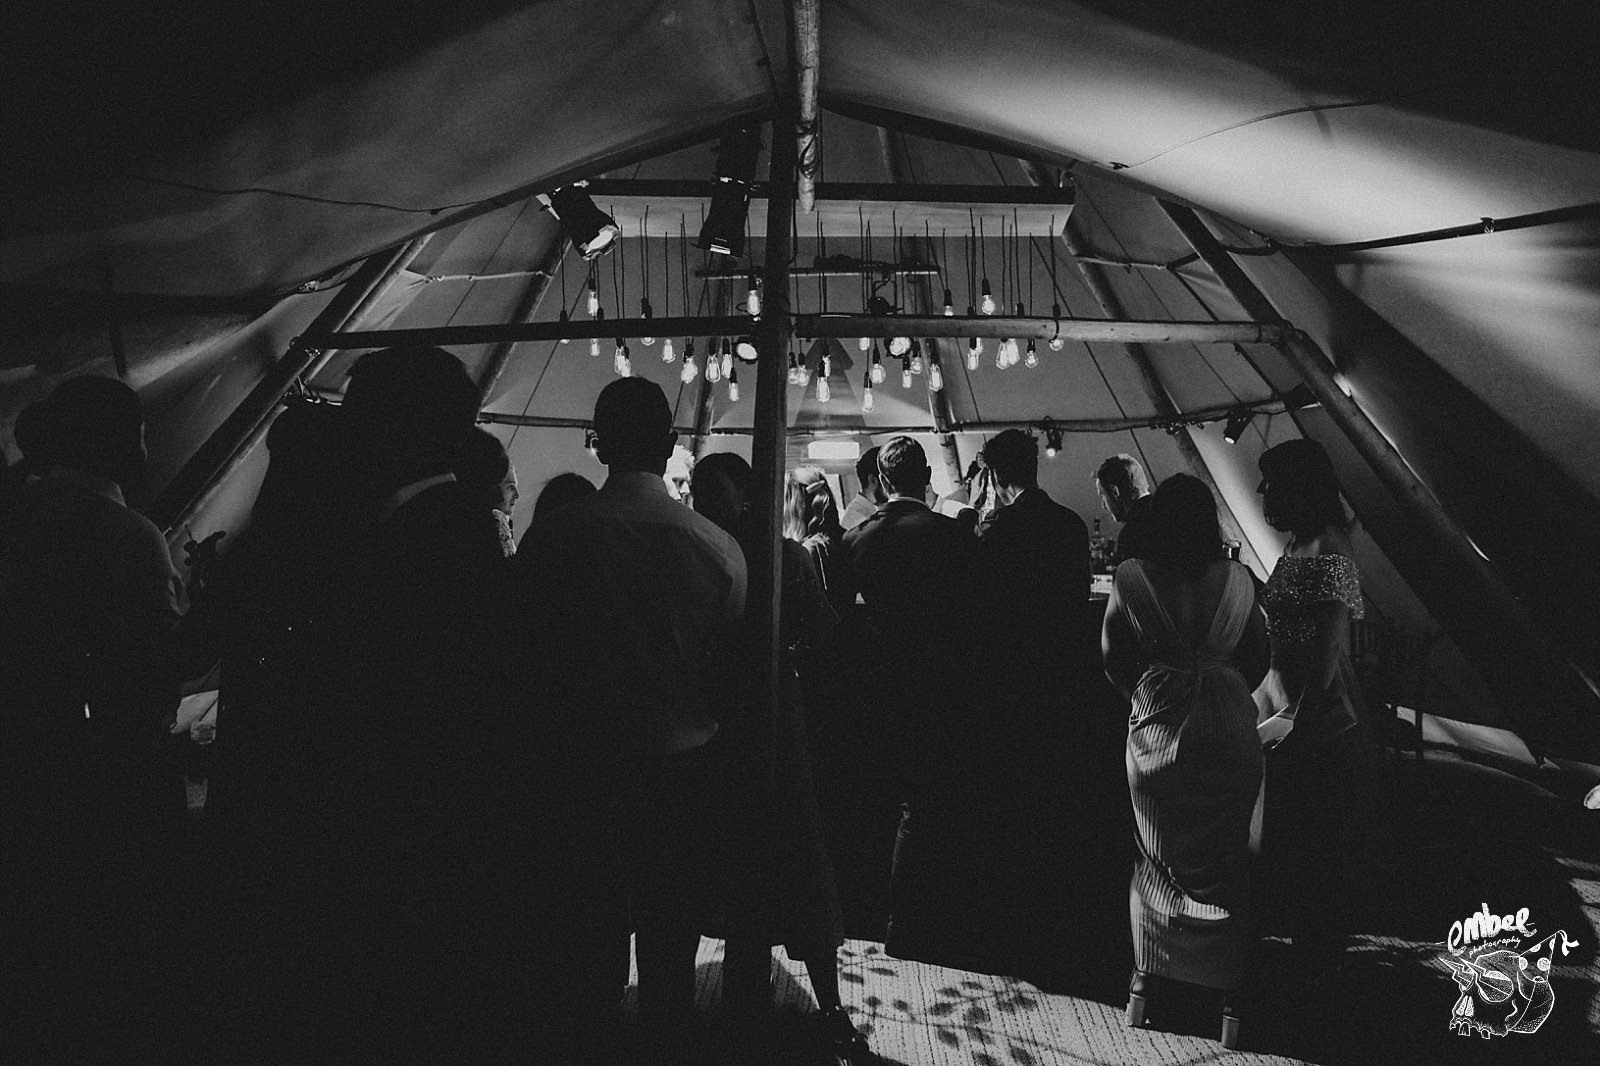 silhouette of people inside teepee